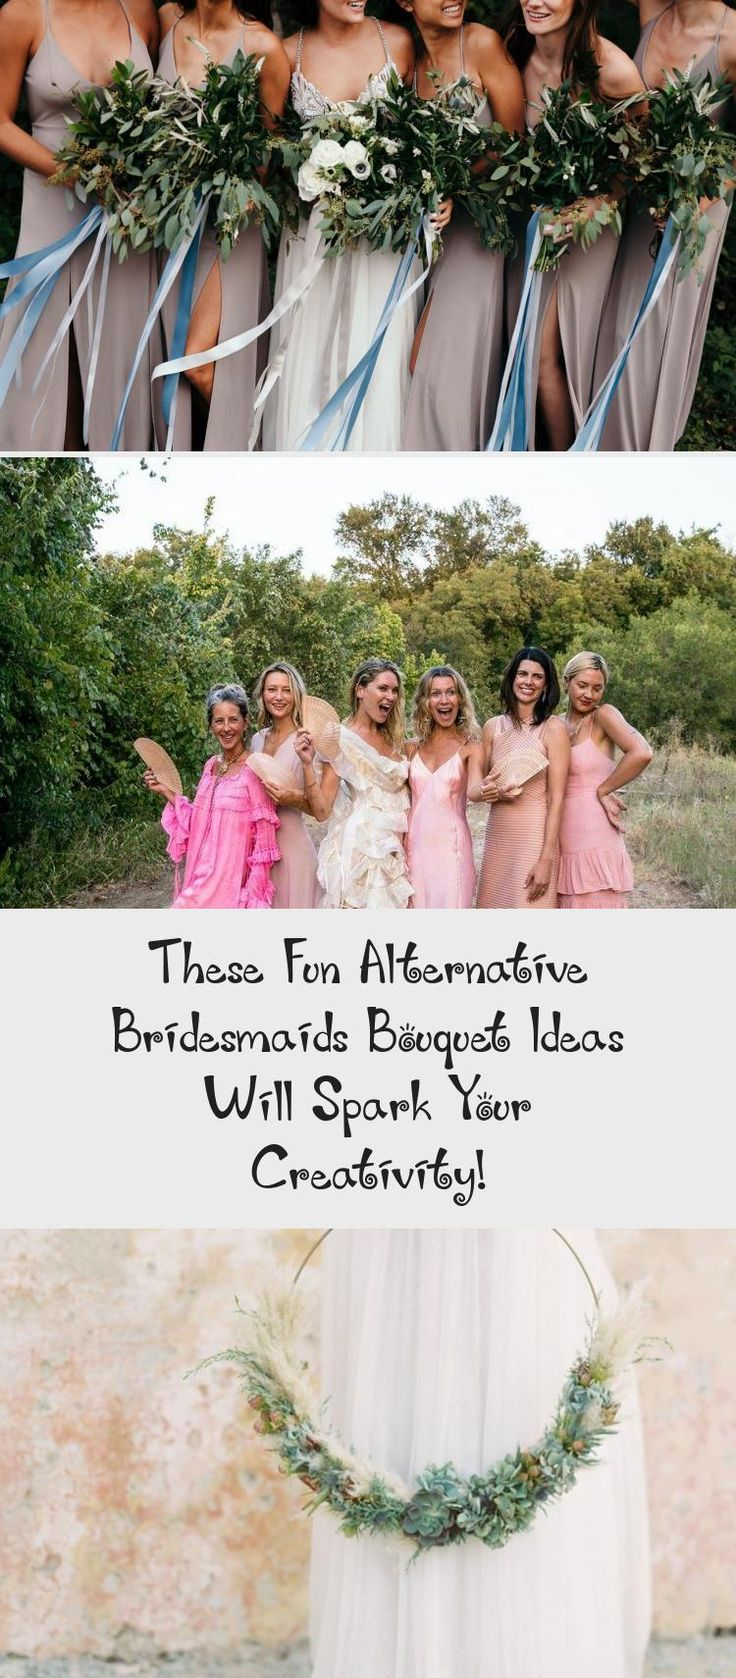 These Fun Alternative Bridesmaids Bouquet Ideas Will Spark Your Creativity! - Green Wedding Shoes #BridesmaidDressesSummer #GreenBridesmaidDresses #PeachBridesmaidDresses #VelvetBridesmaidDresses #MaroonBridesmaidDresses